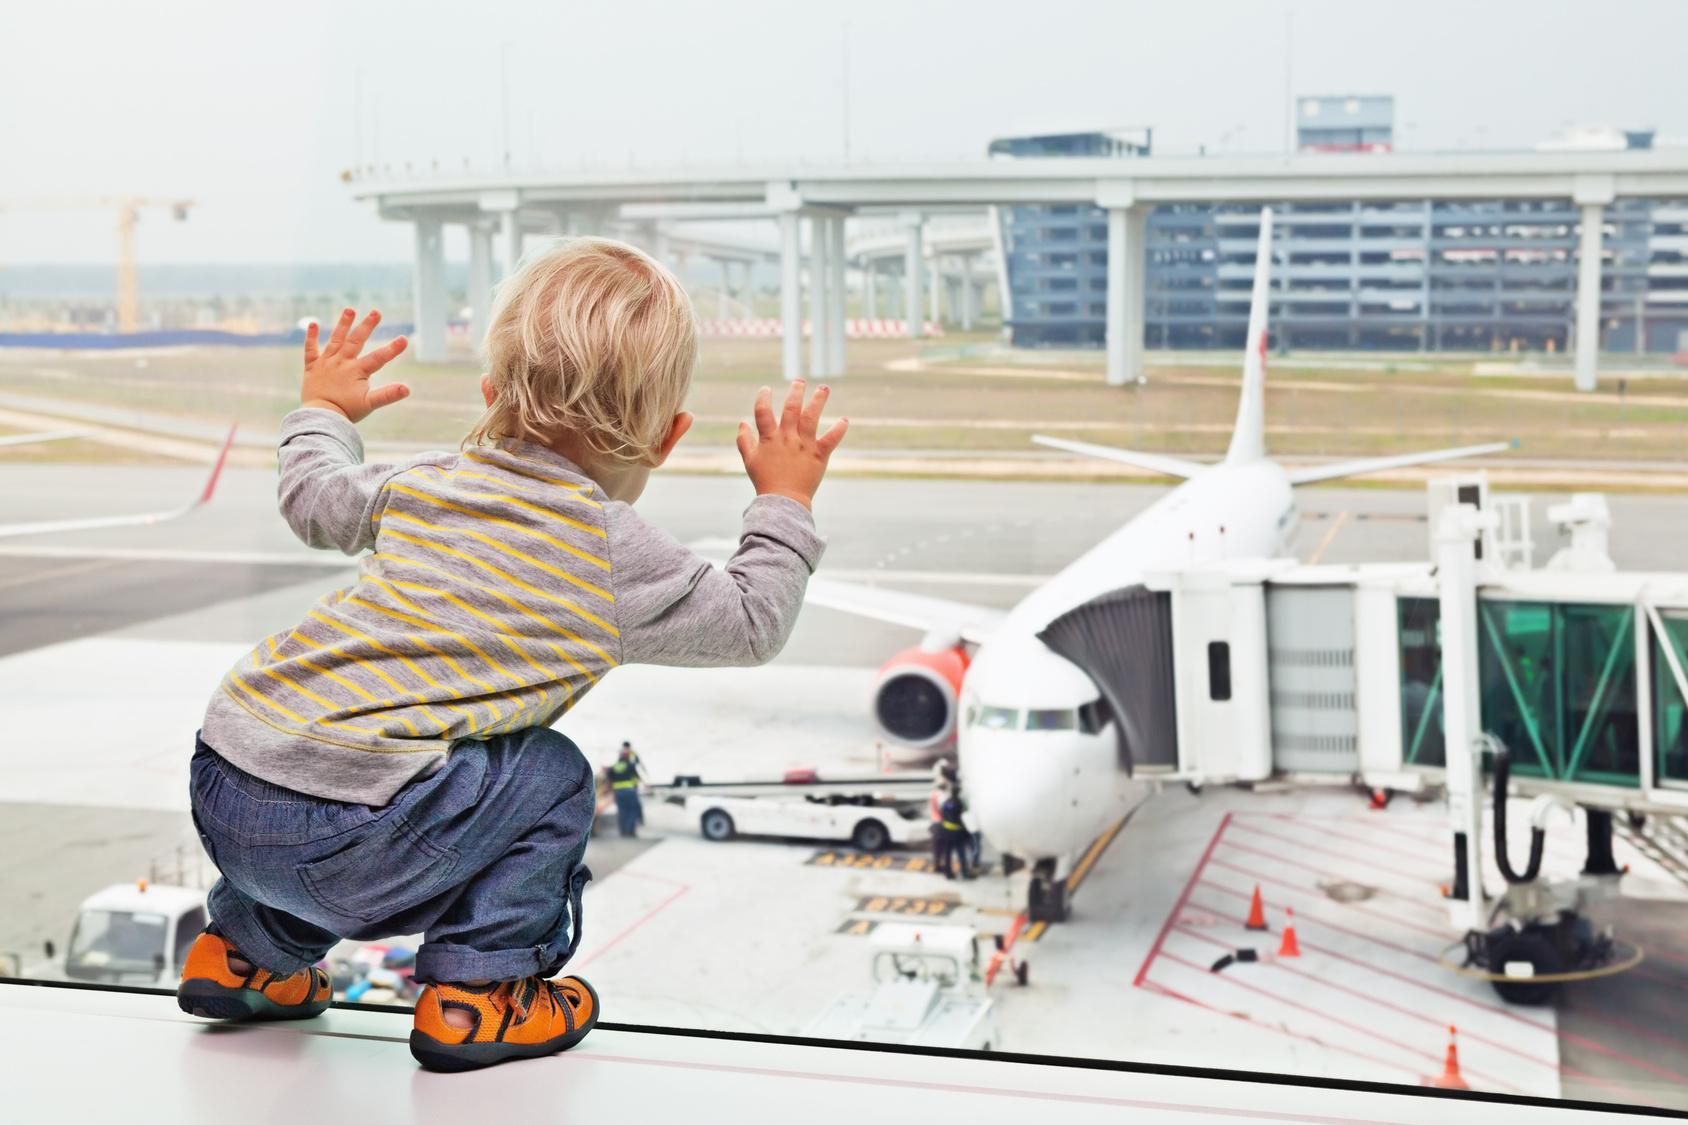 Фото из аэропорта ребенка